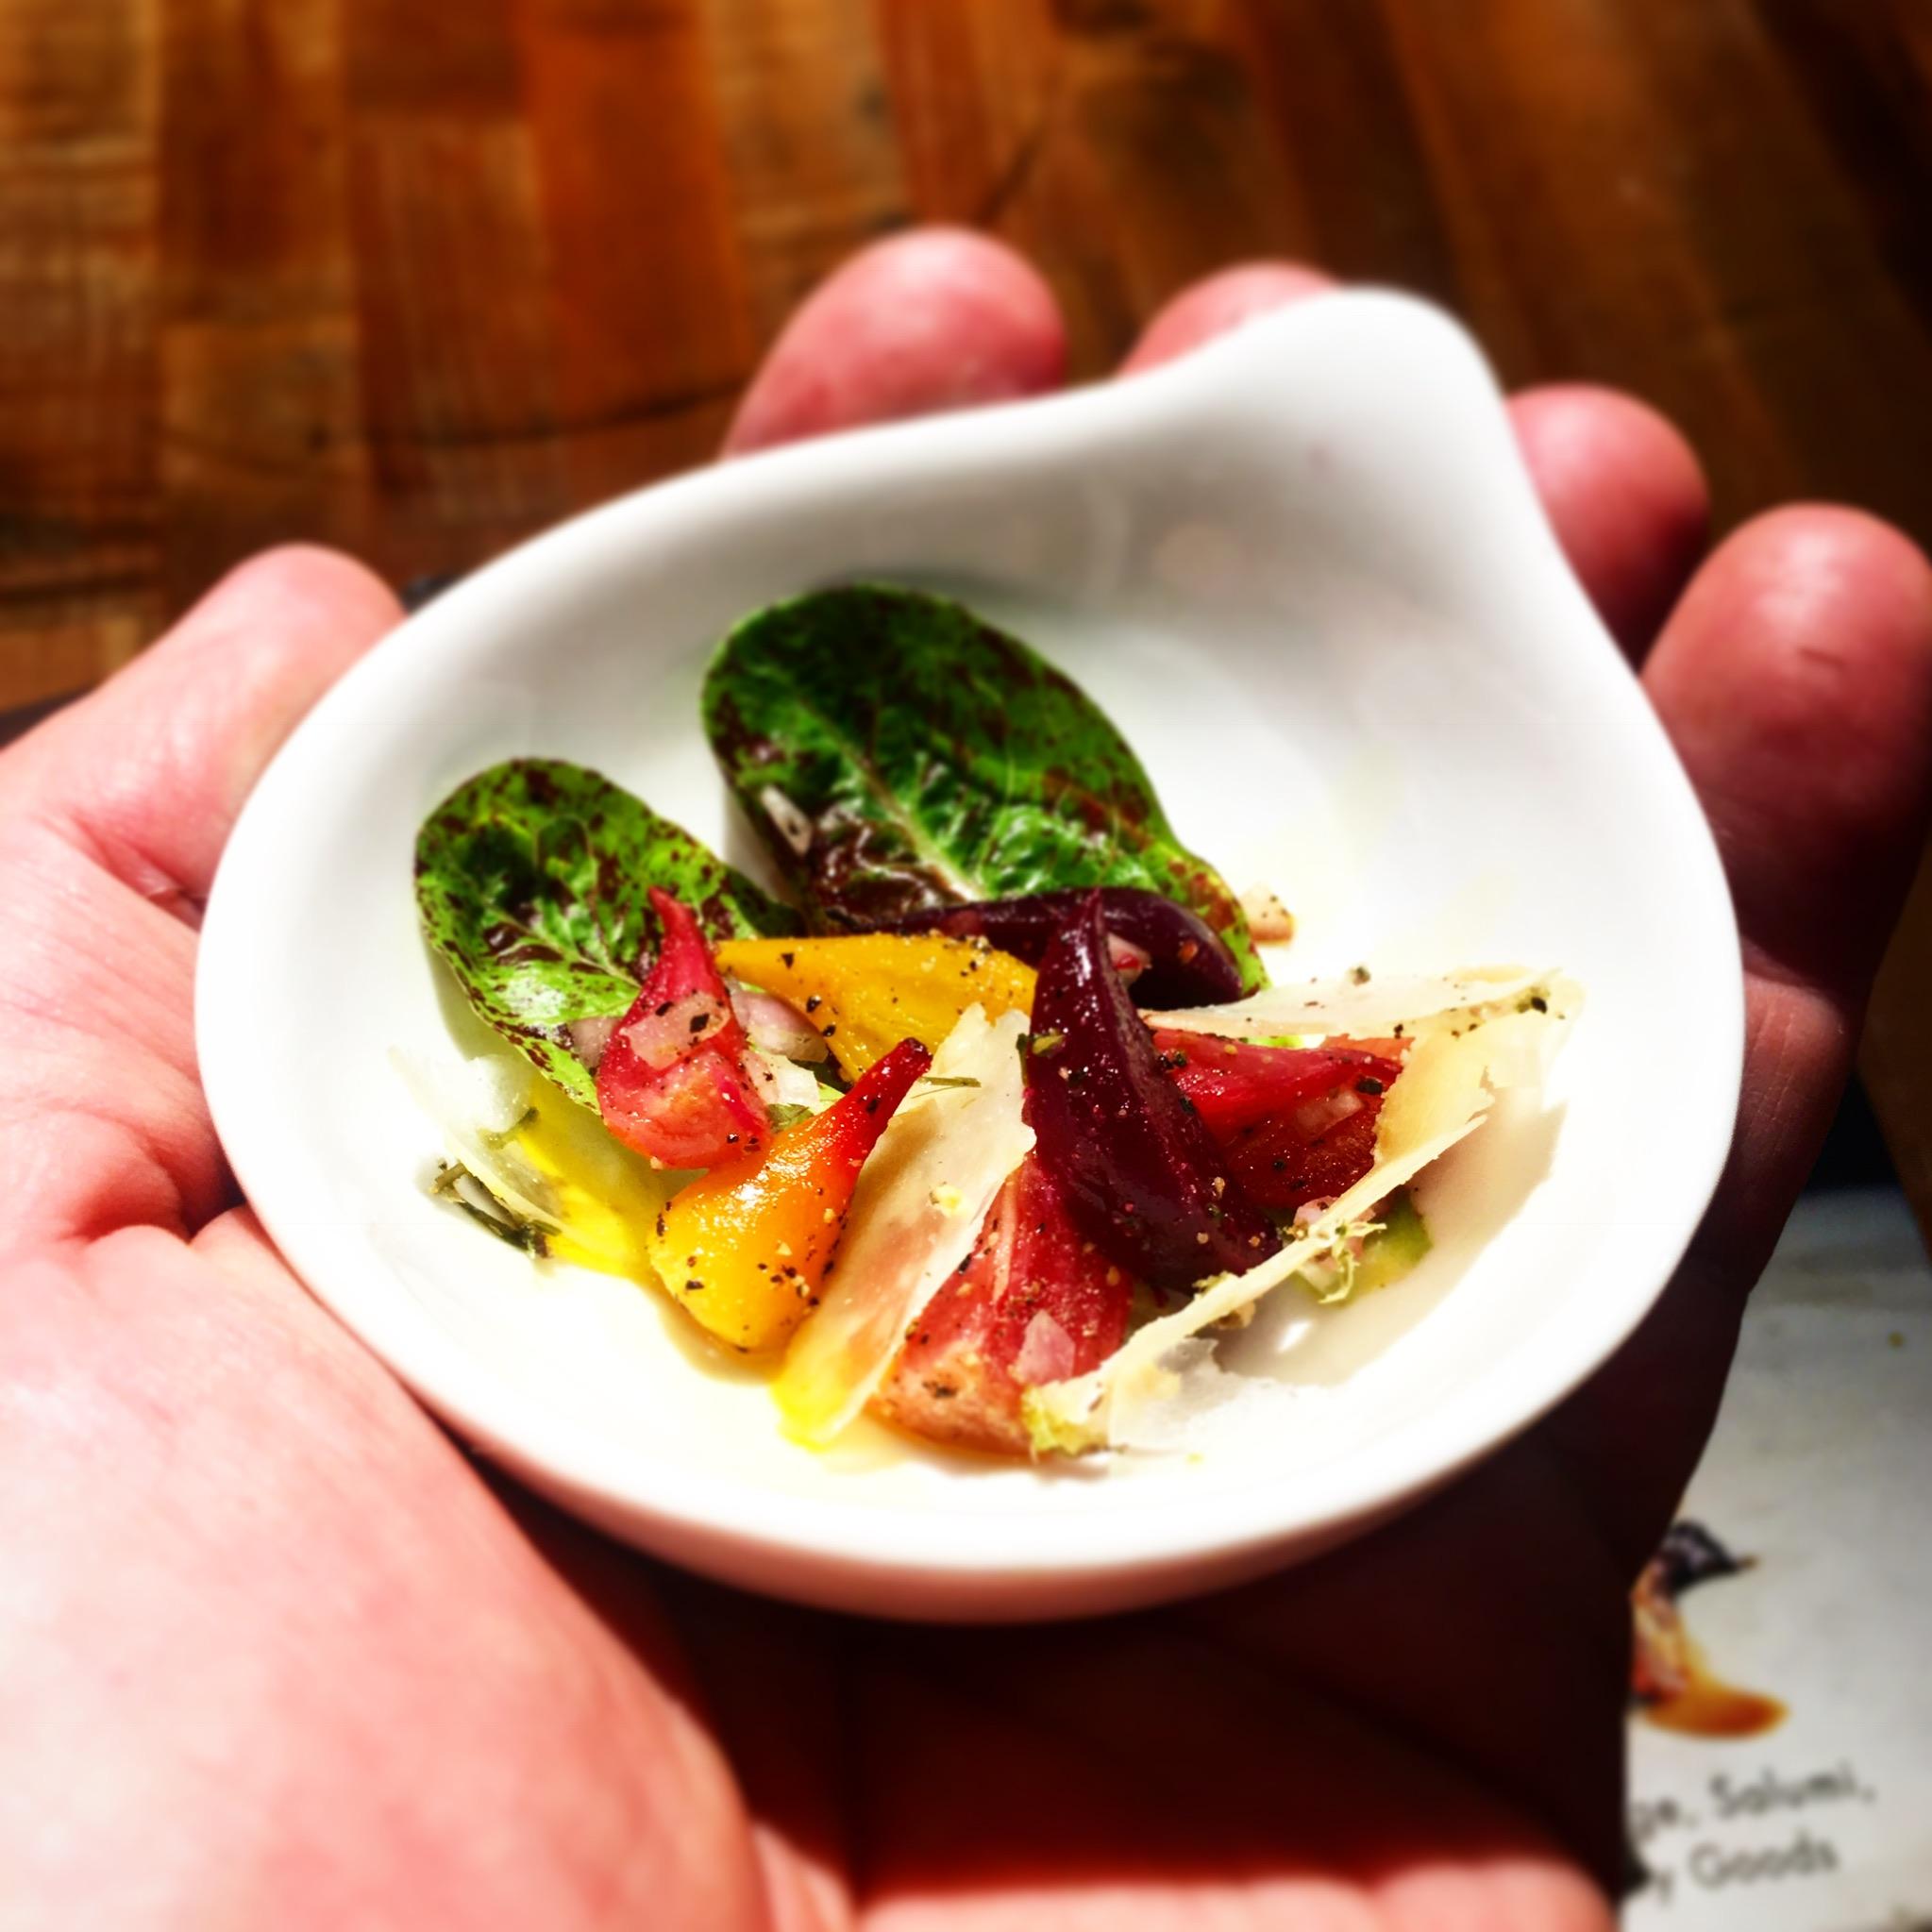 baby beet salad chef vincent nattress.JPG